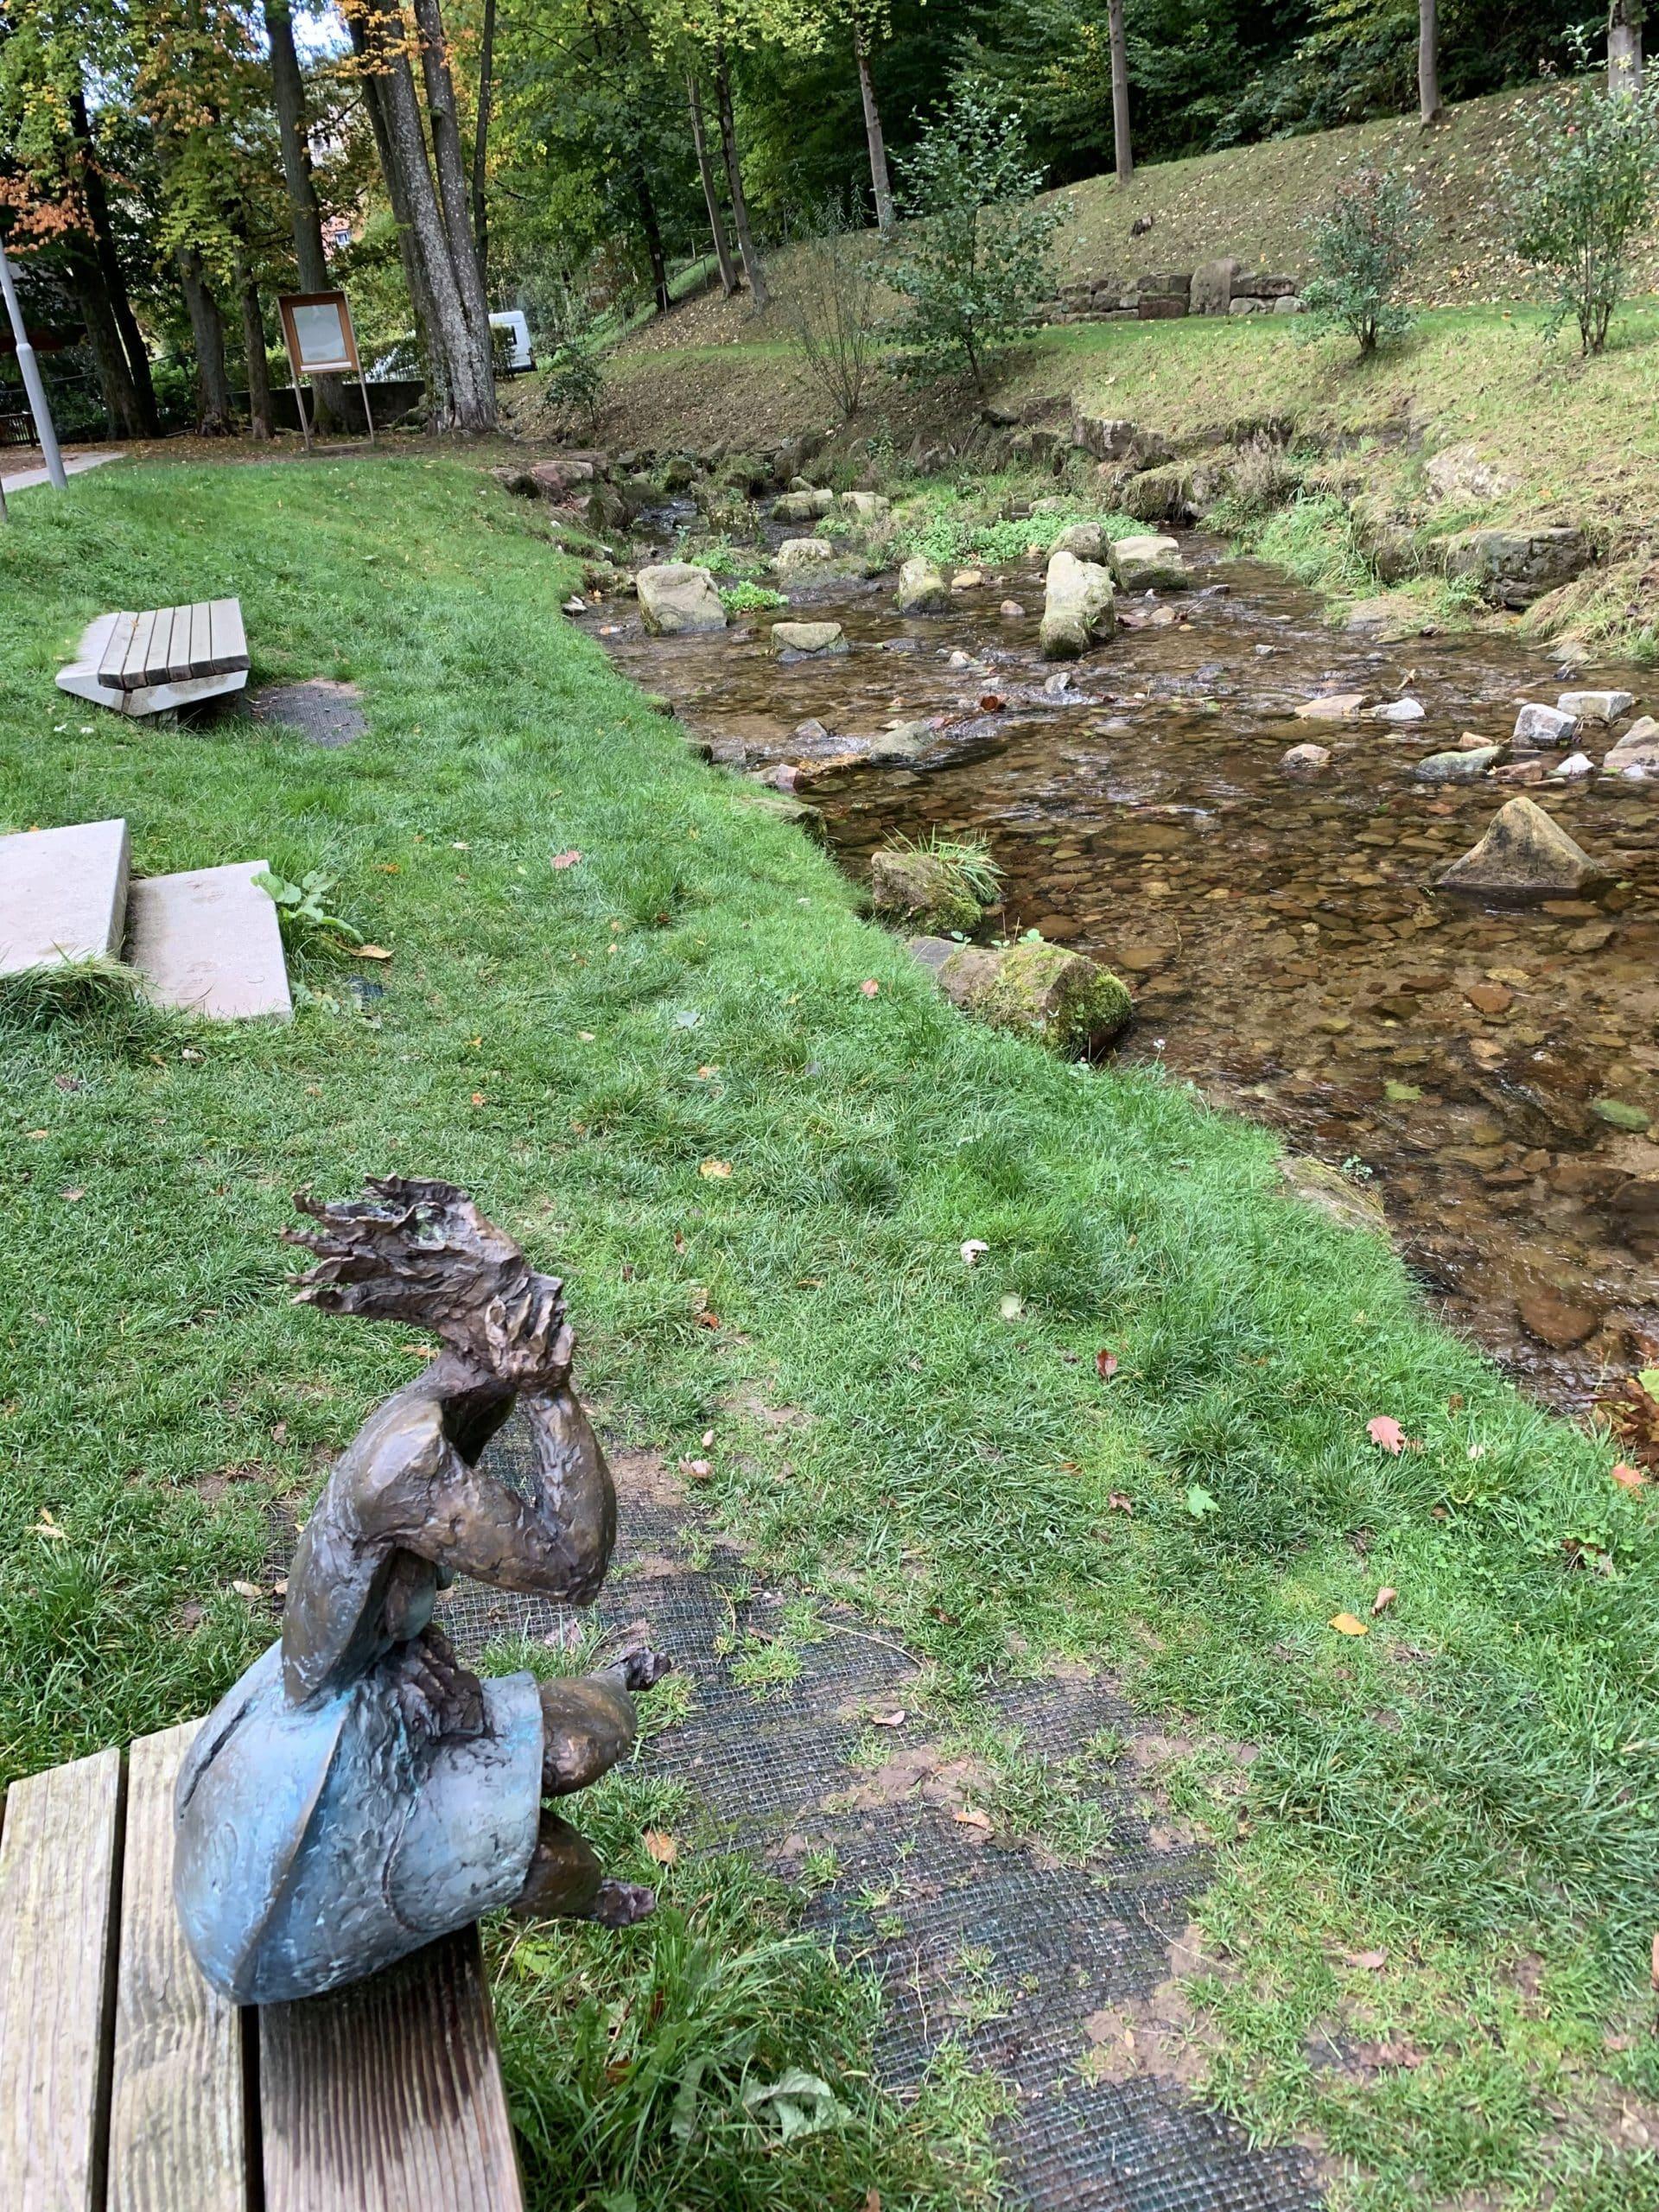 Bad Herrenalb eingebettet in unberührte Natur